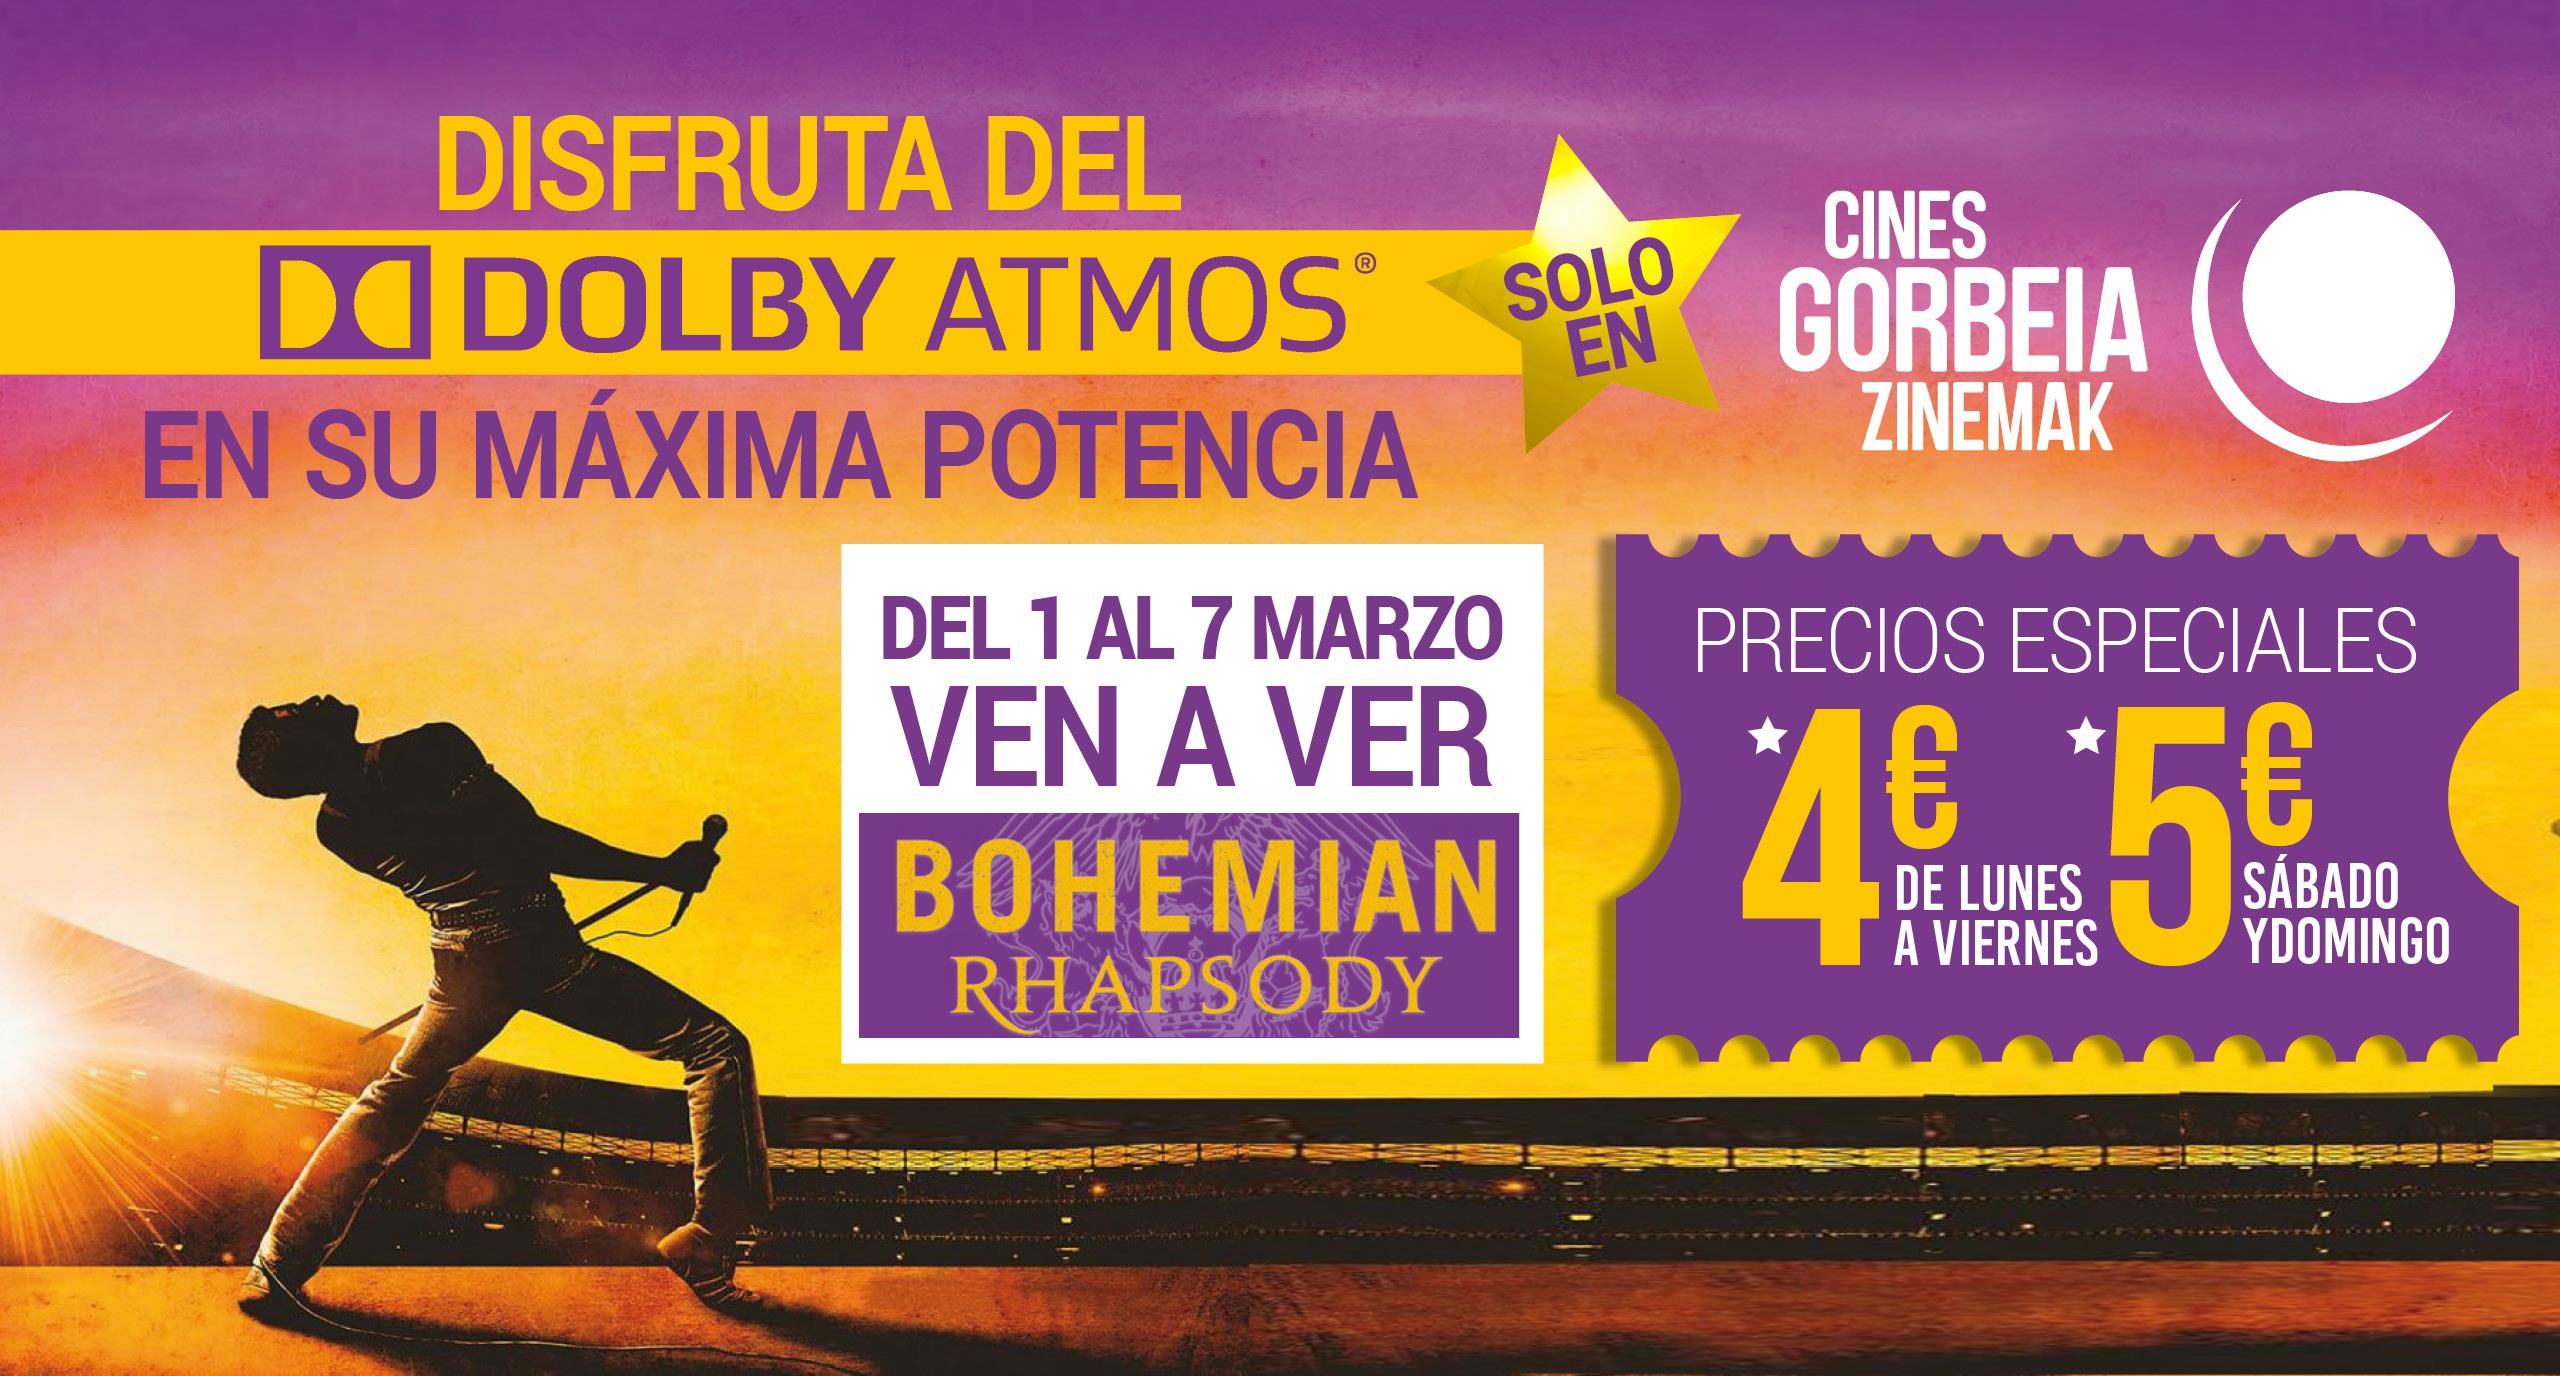 ¡Bohemian Rhapsody en Dolby Atmos del 1 al 7 de marzo!